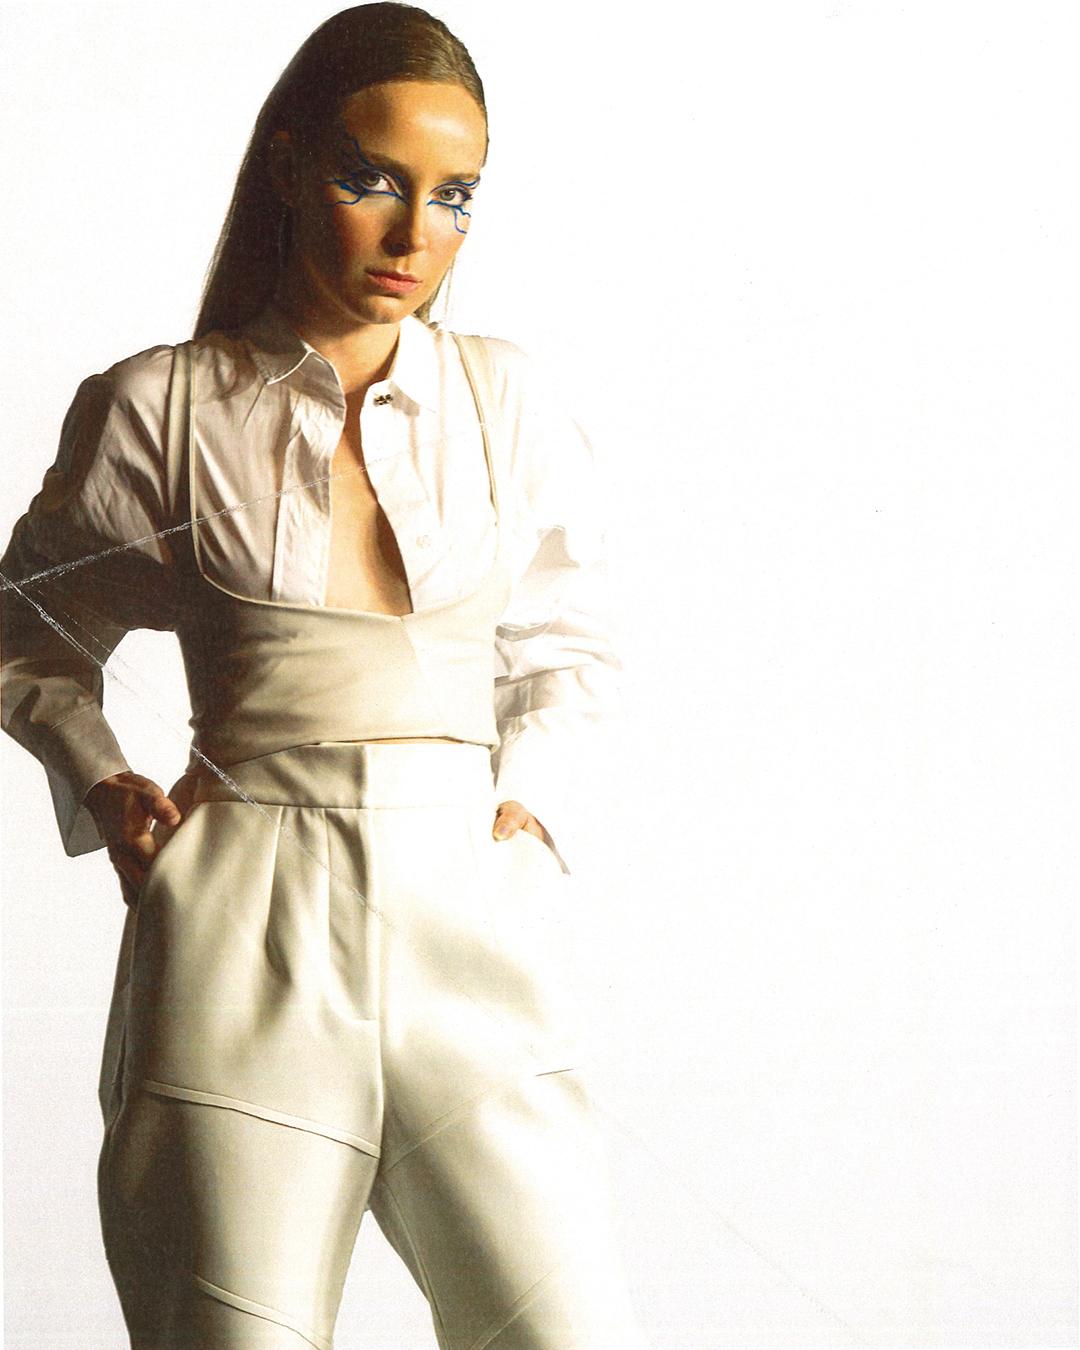 Pantalones MARLO STUDIO / camisa ZARA / corset FÁTIMA MIÑANA / zapatos ZARA